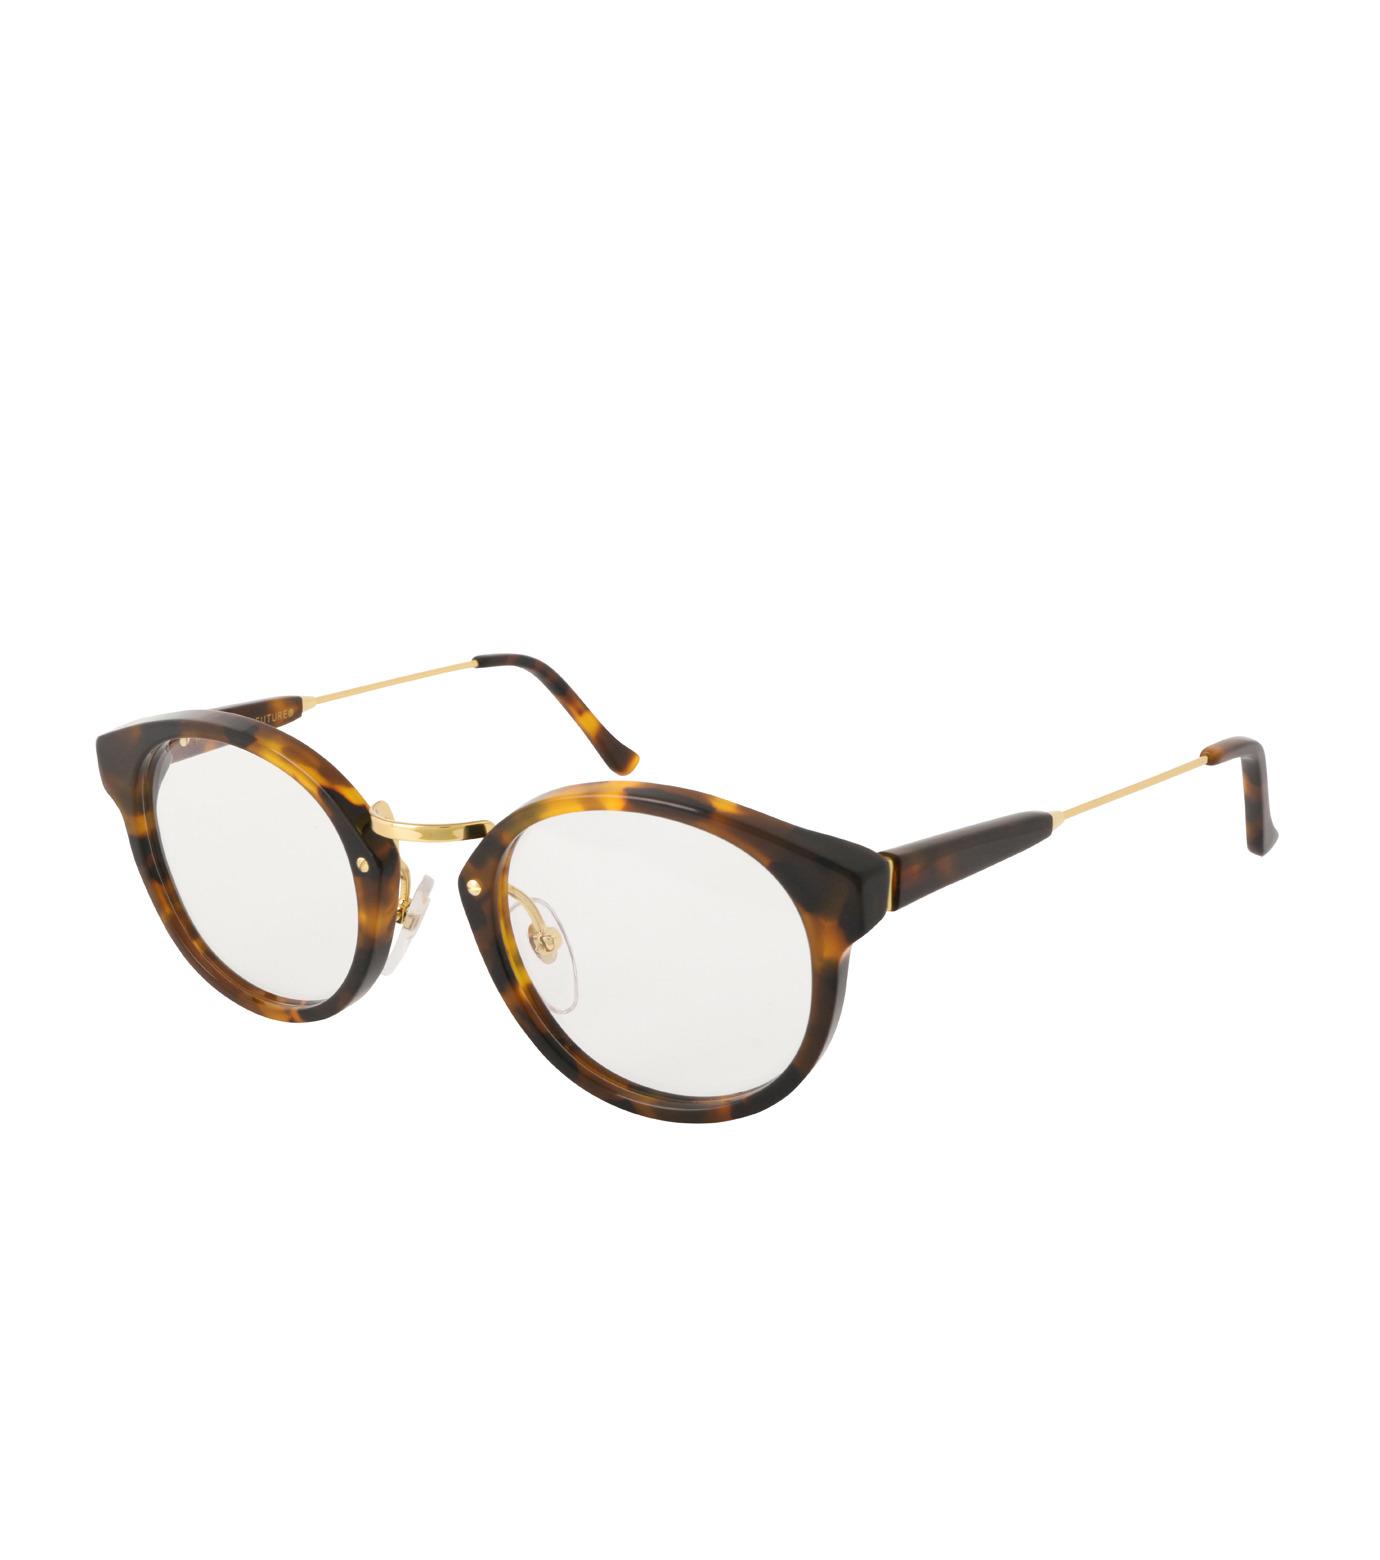 SUPER(スーパー)のPANAMA HAVANA CLASSIC CLEAR LENS-BROWN(アイウェア/eyewear)-SPRXXXX055-42 拡大詳細画像1